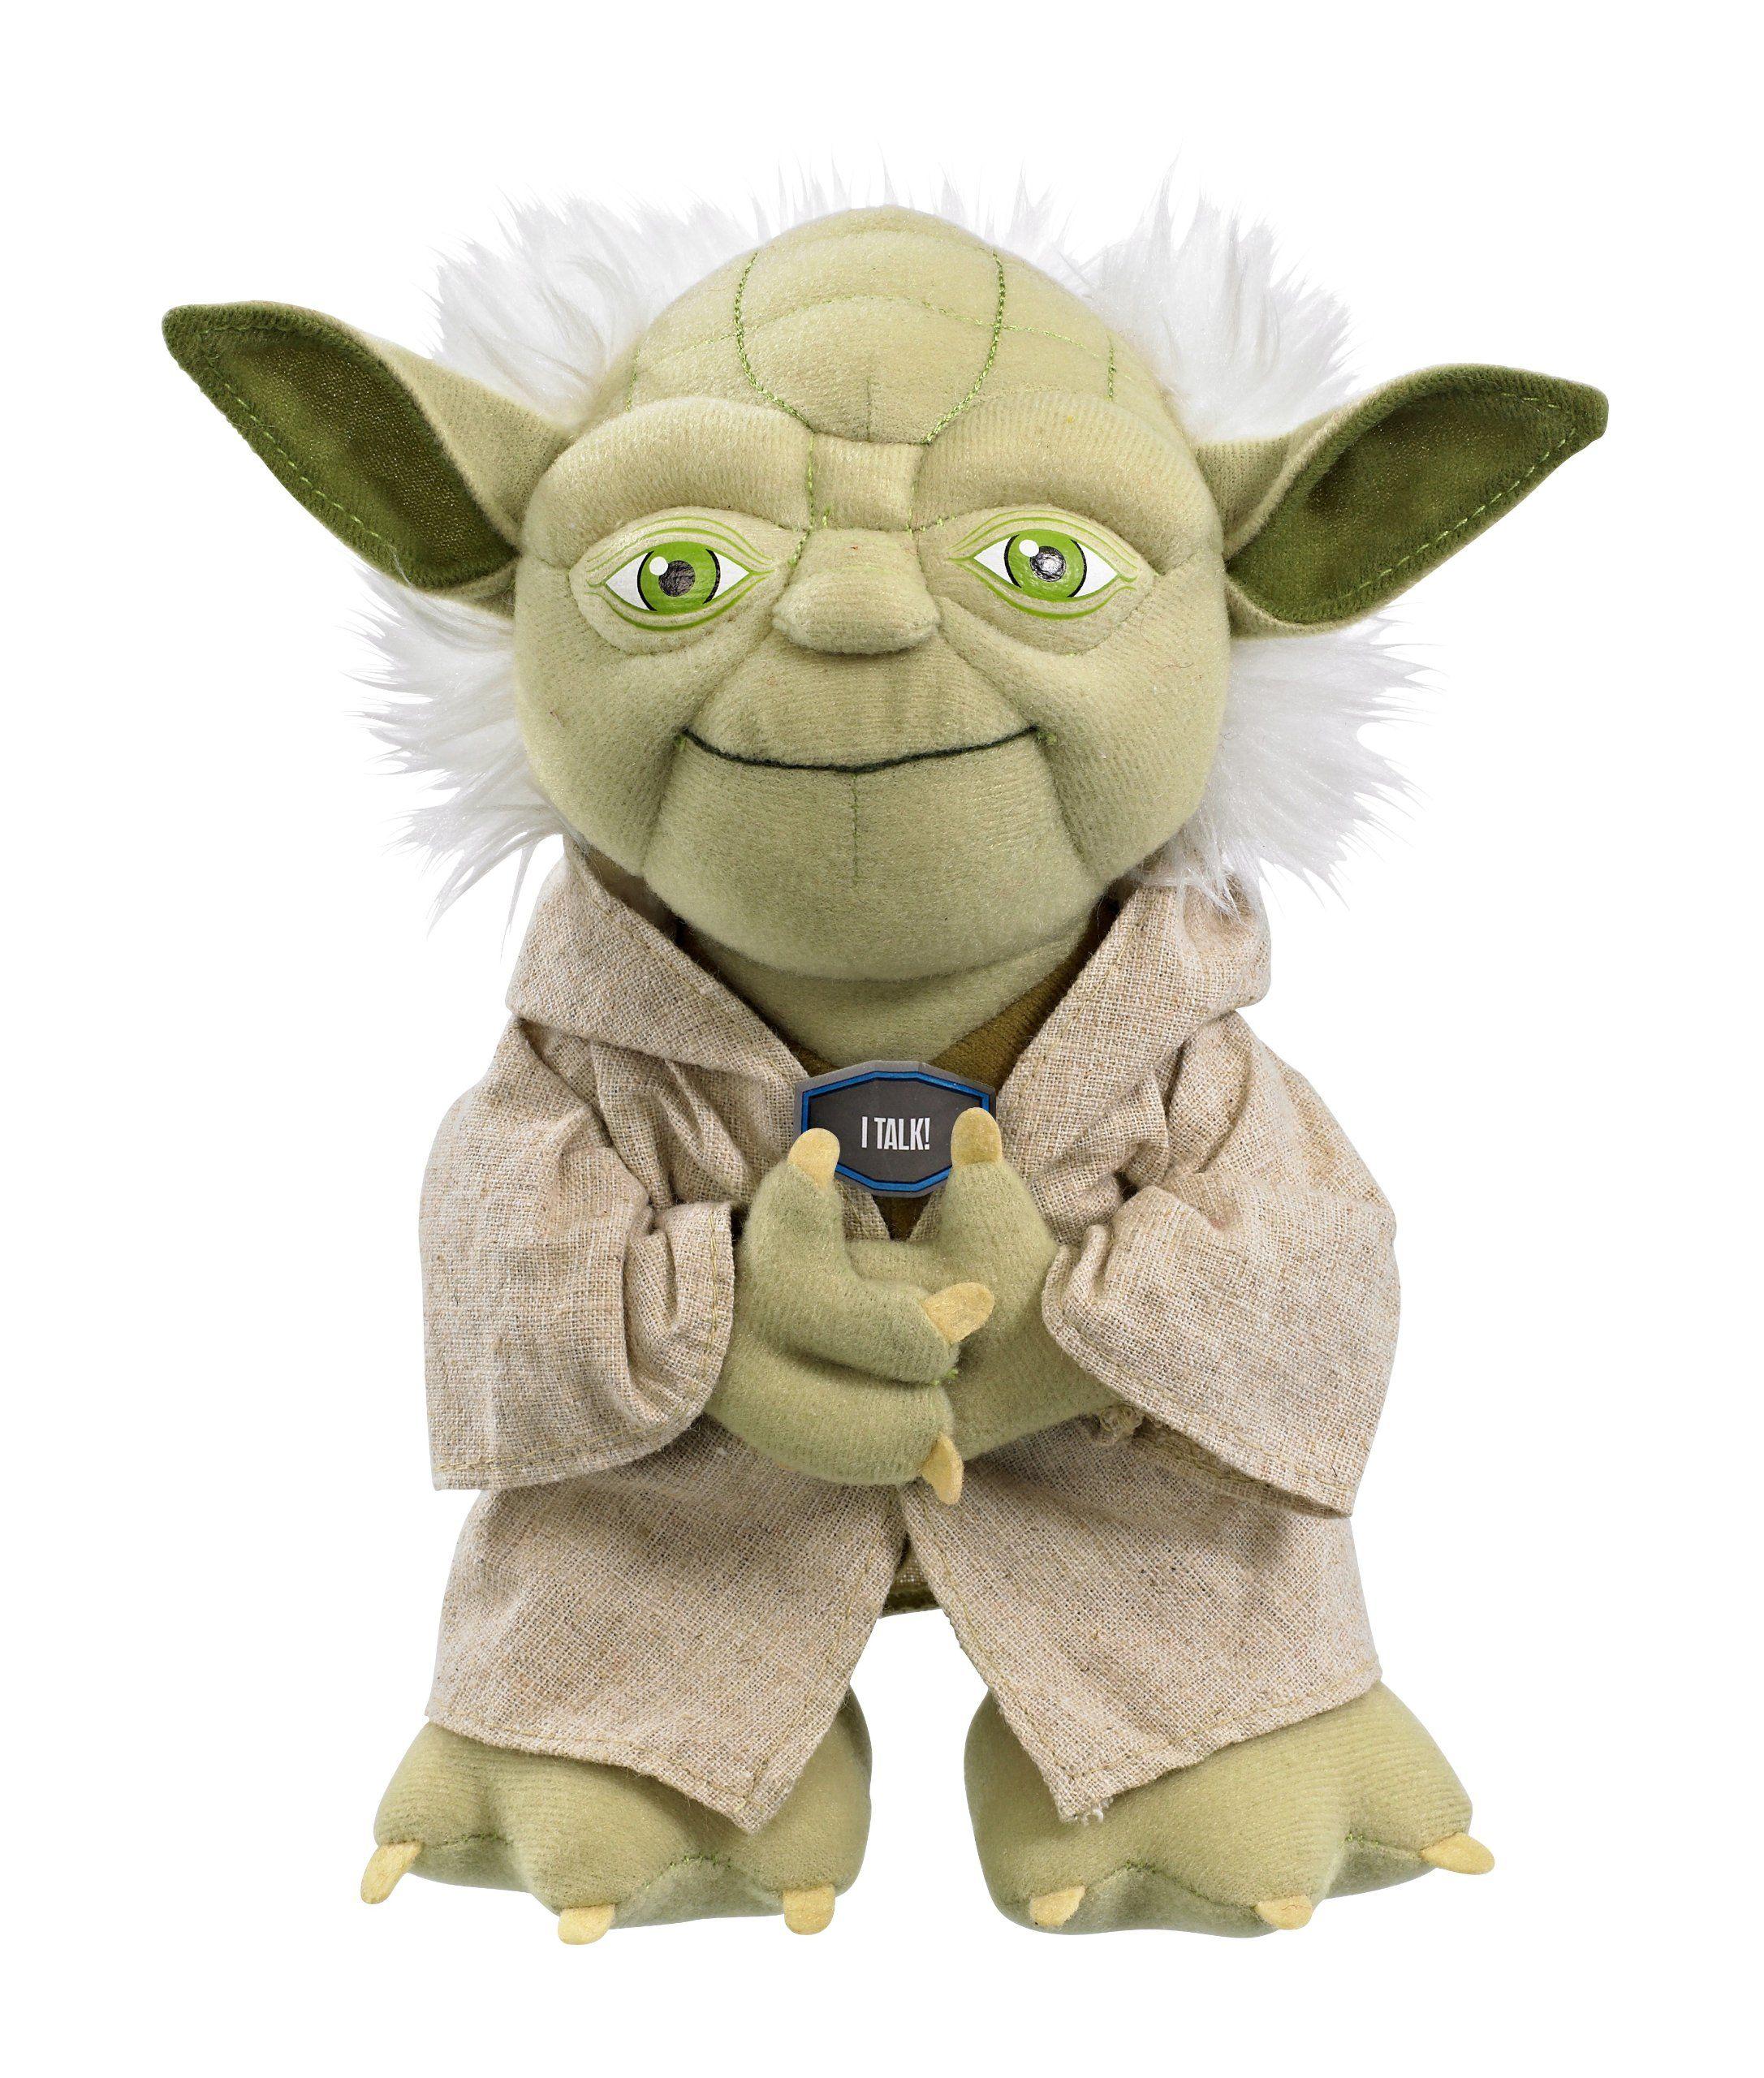 Joy toy star wars 100172 talking yoda plush toy 23 cm in